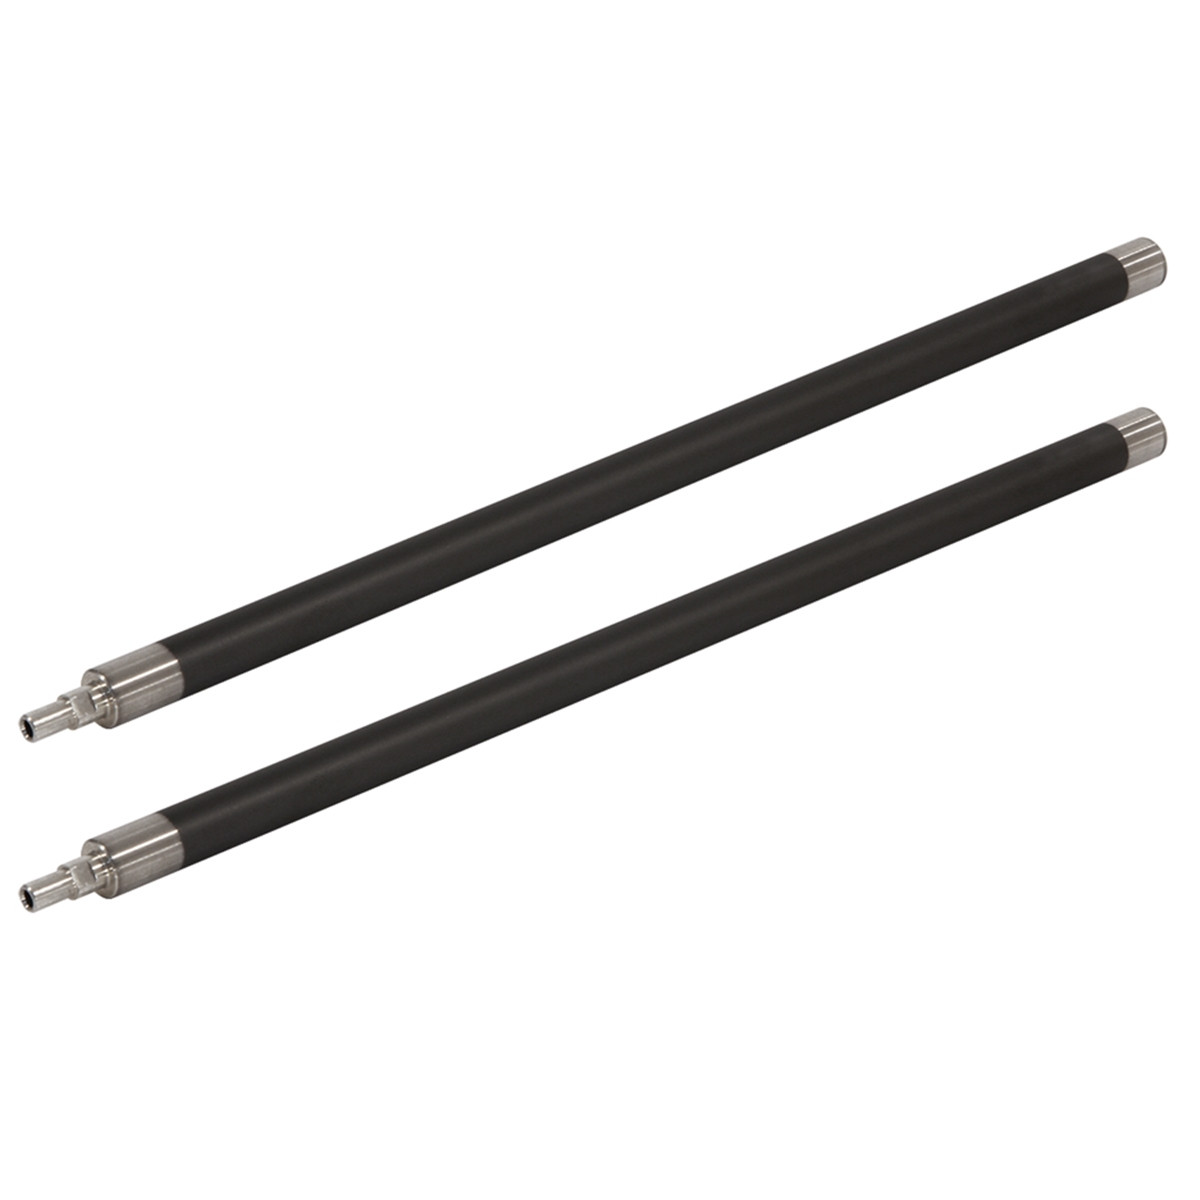 Kit 2 Rolo Magnético HP CB435A | 435A | 35A | P1006 | P1005 Importado